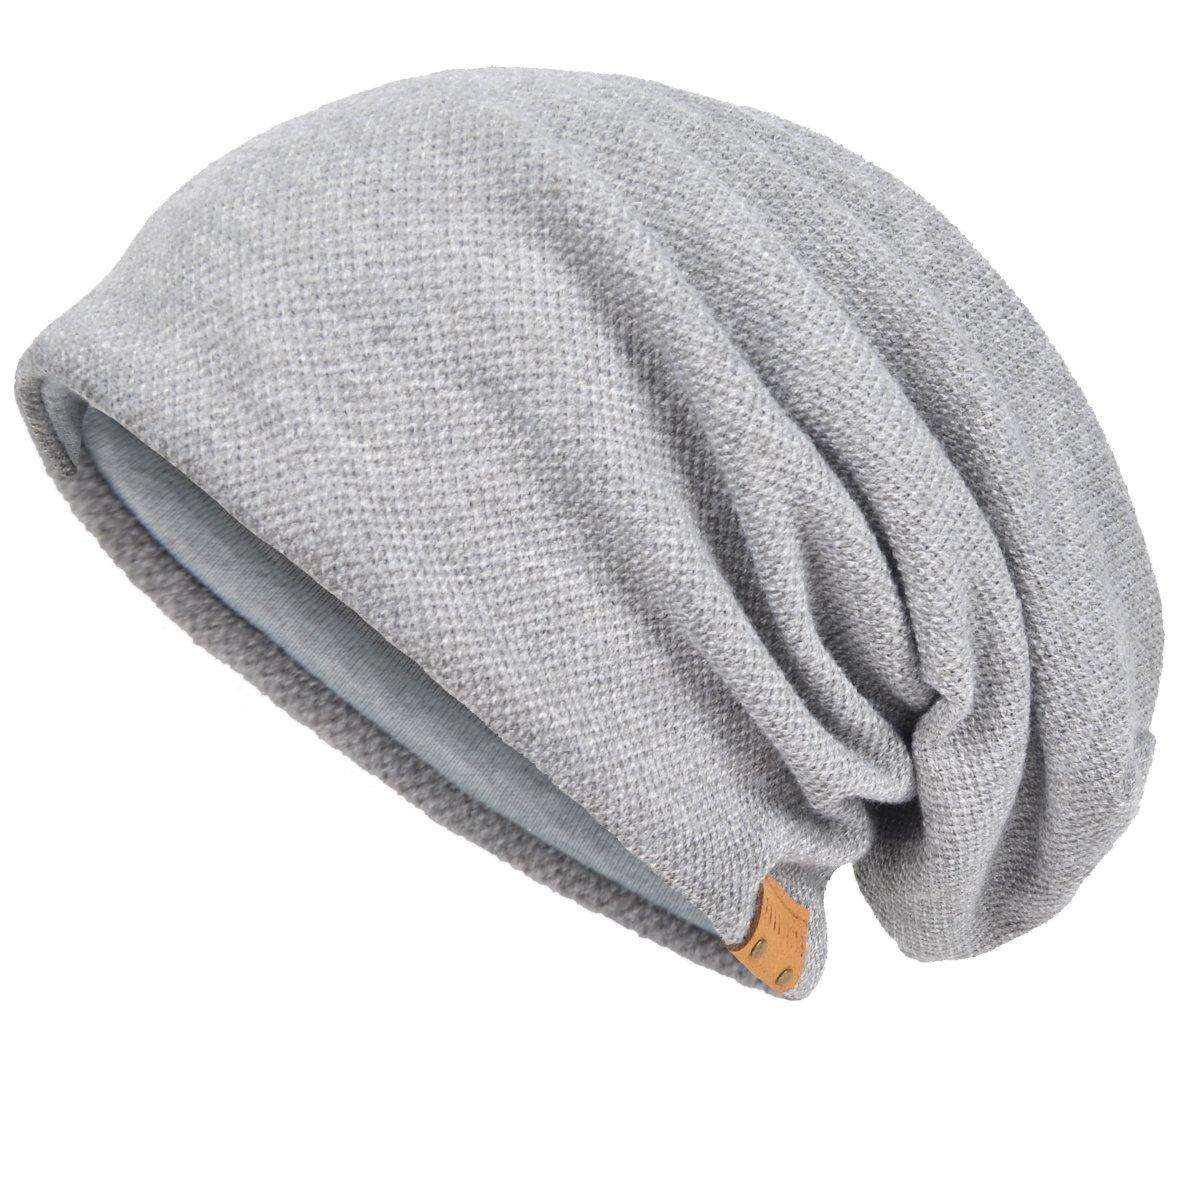 JESSE · RENA Men's Slouch Beanie Skull Cap Lined Oversize Baggy Winter Hat CFB305 CF-B305-MD